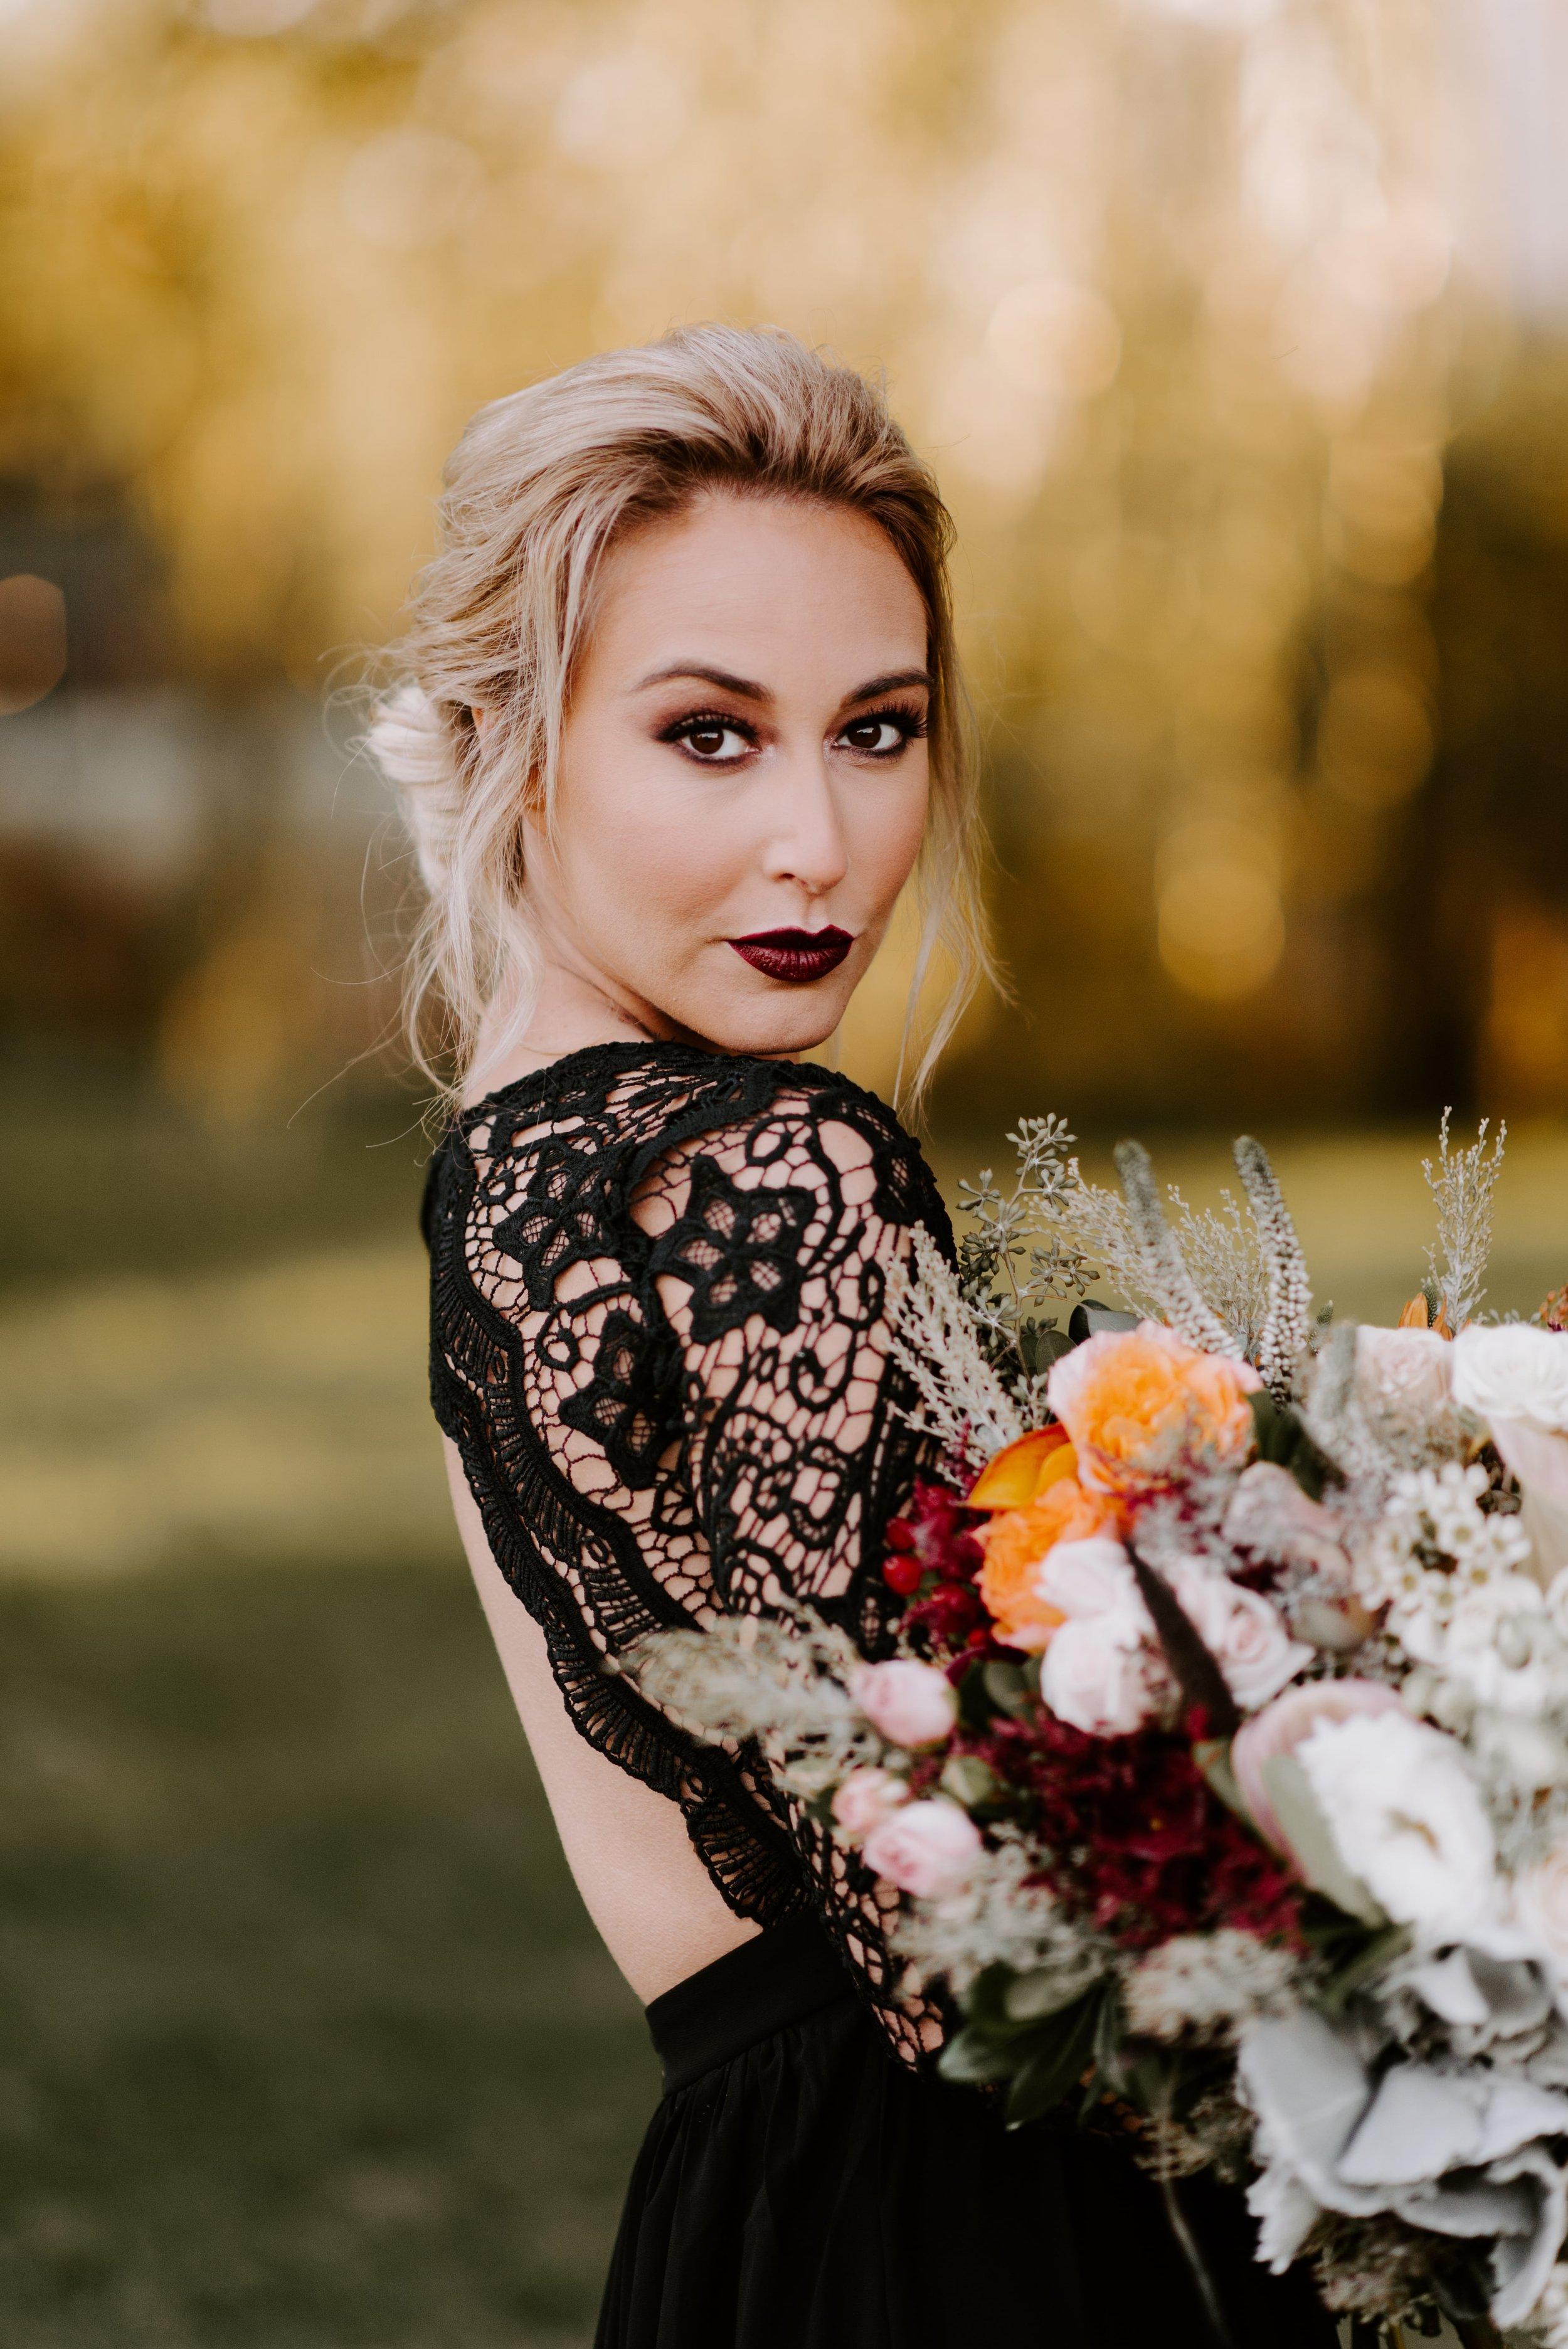 Chicago wedding photographer Marissa Kelly Photography